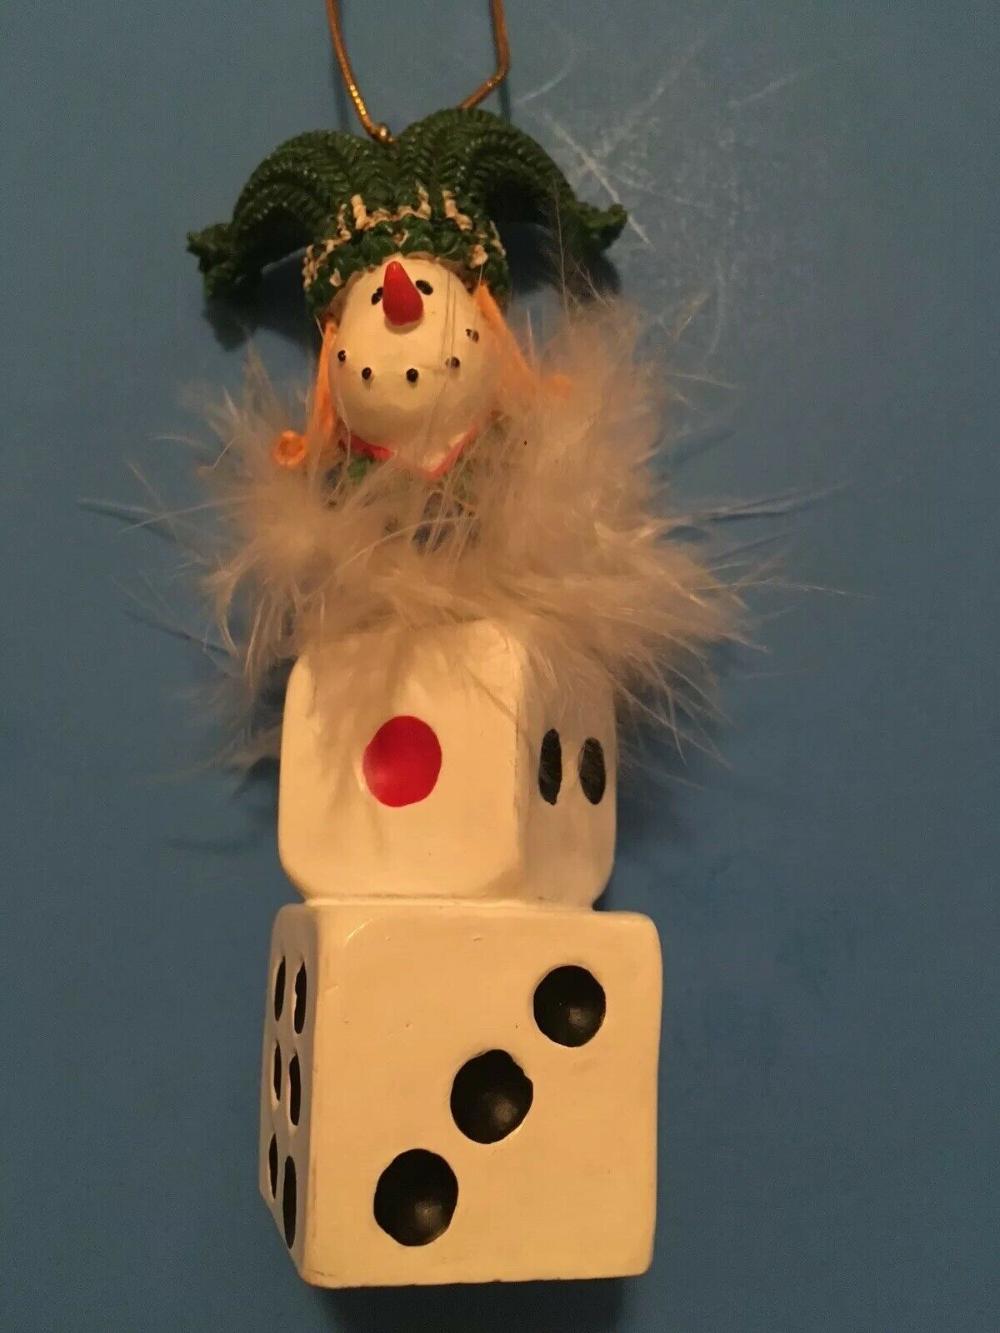 Cute Las Vegas Gambling Snowman Joker Dice Christmas Winter Ornament Bunco Ebay Winter Ornaments Snowman Ornaments